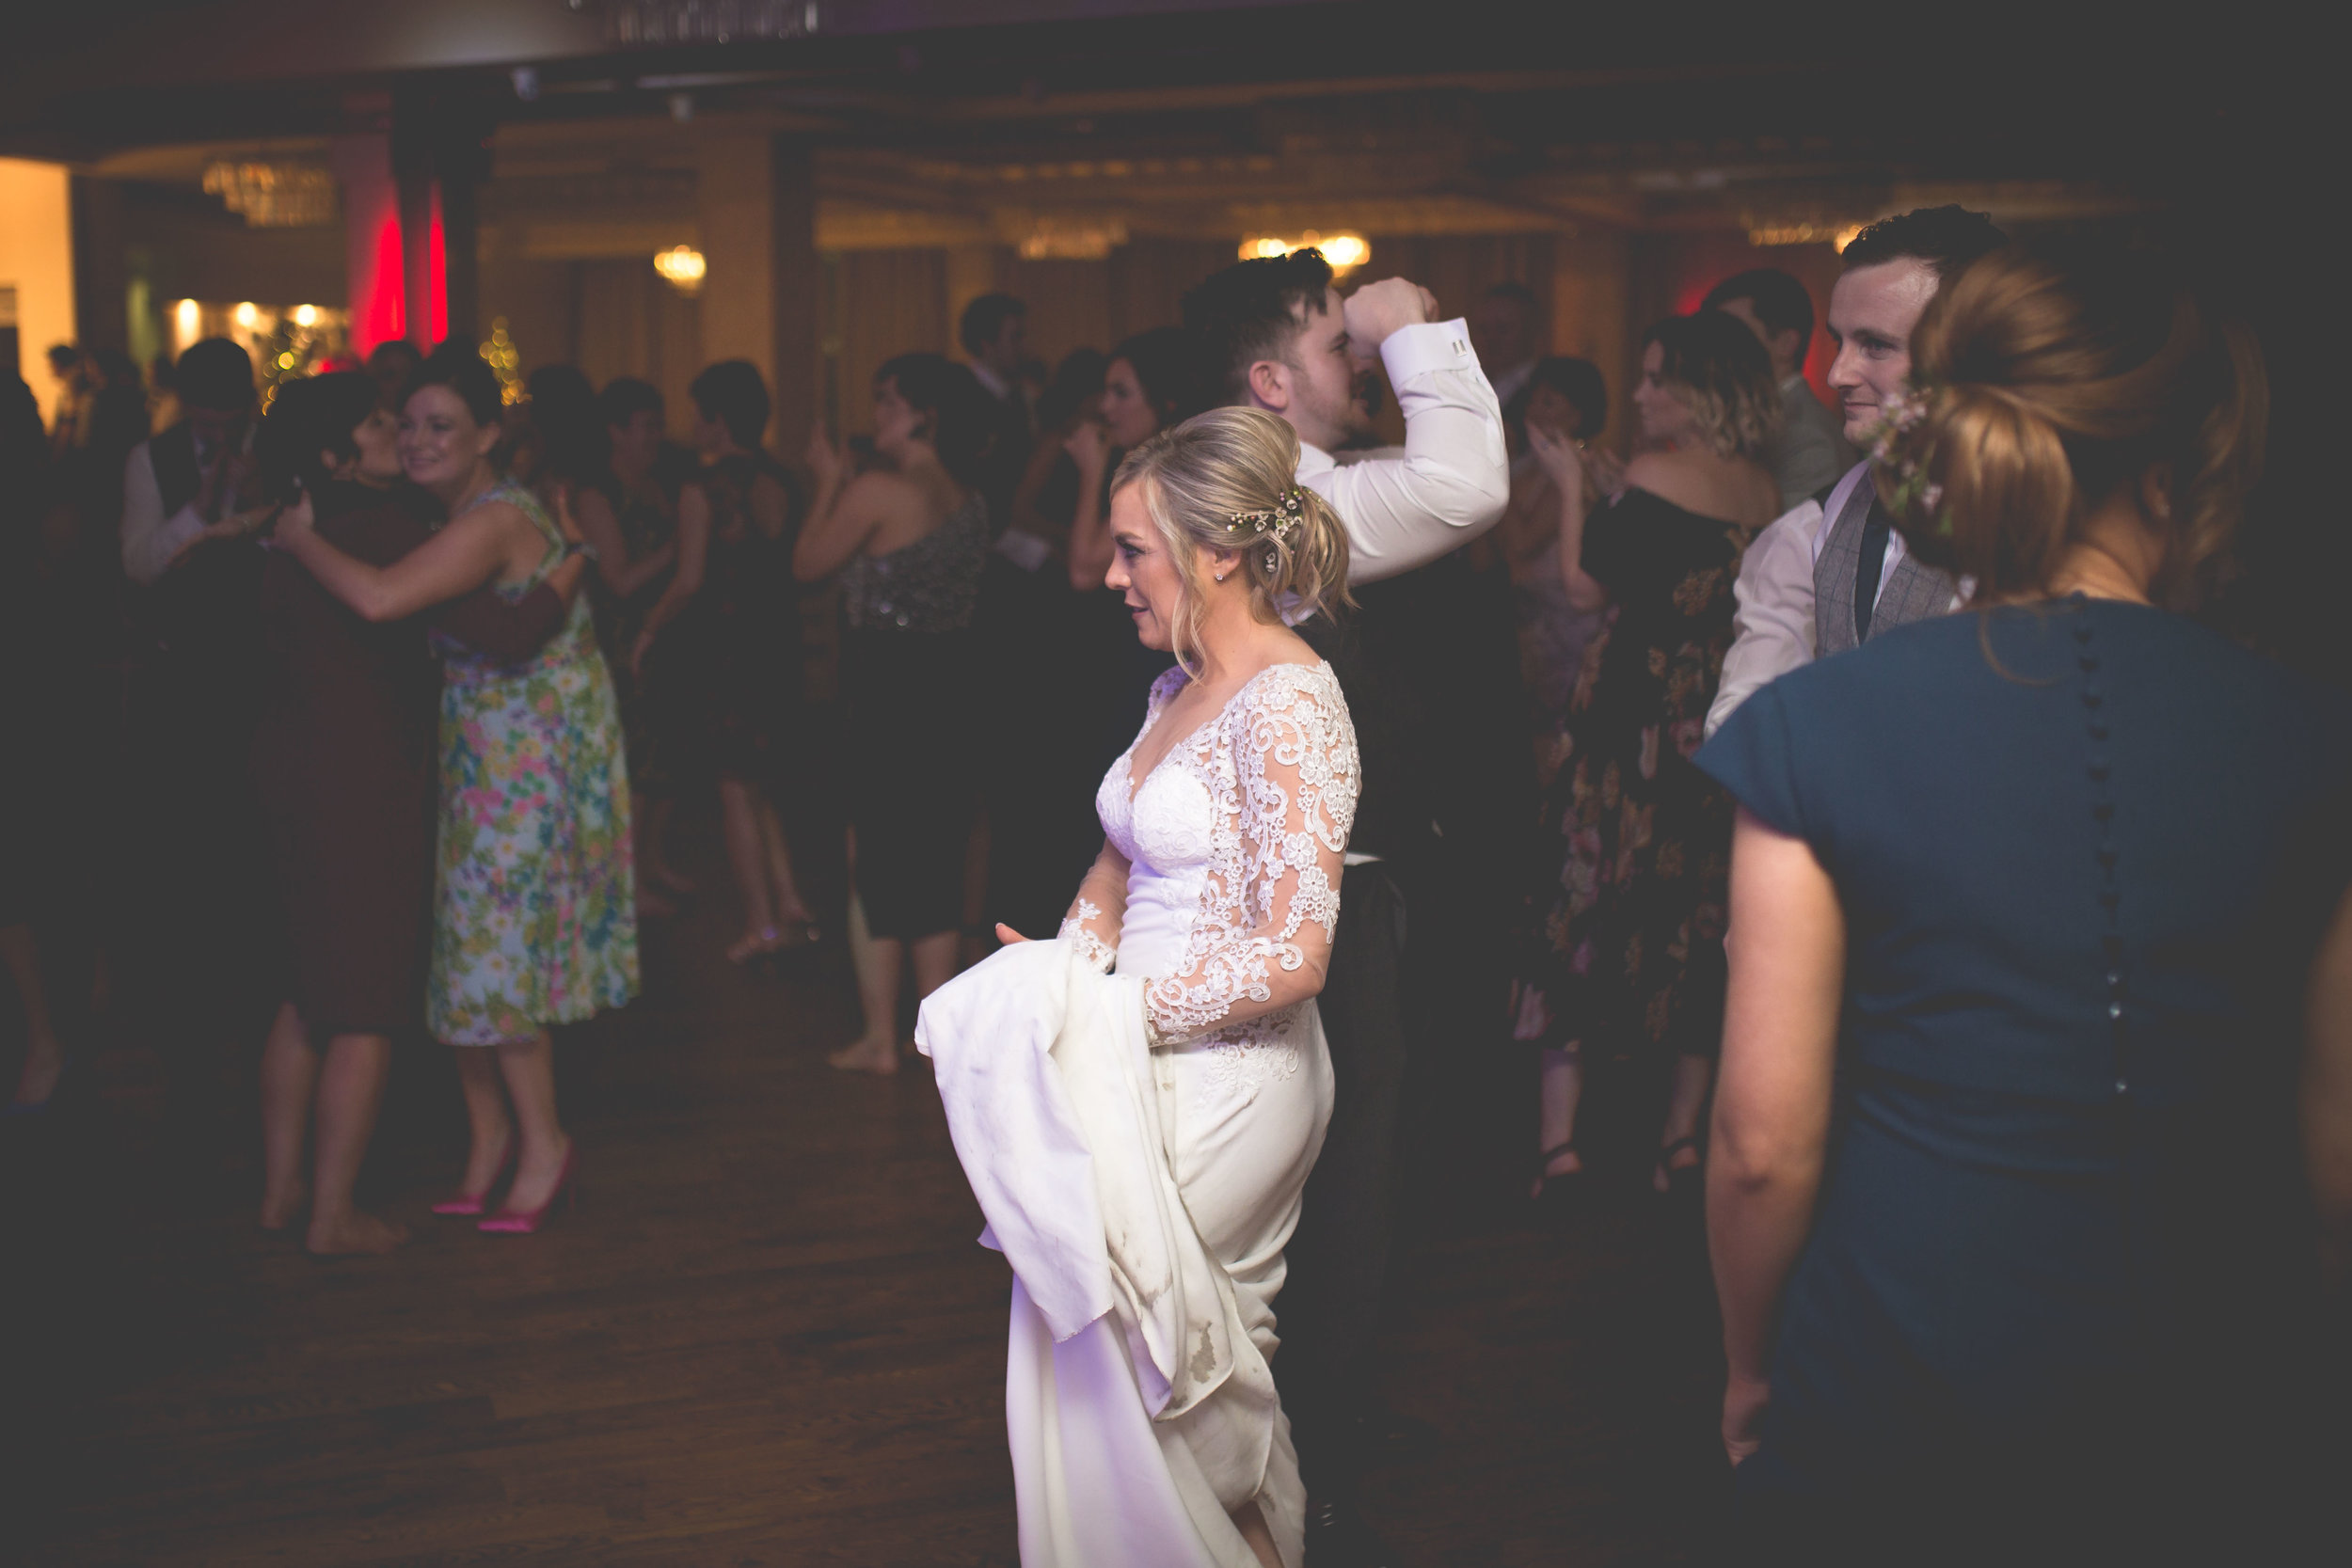 MaryJo_Conor_Mageean_Dancing-13.jpg